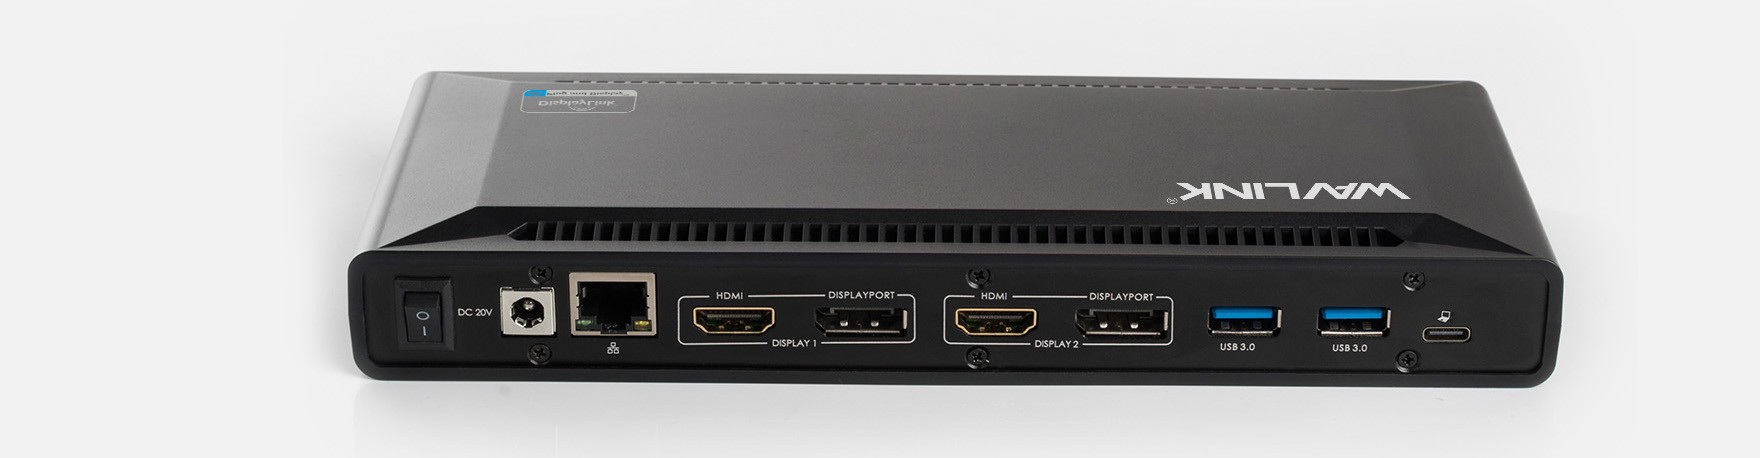 Wavlink USB-C DUAL 4k HUB